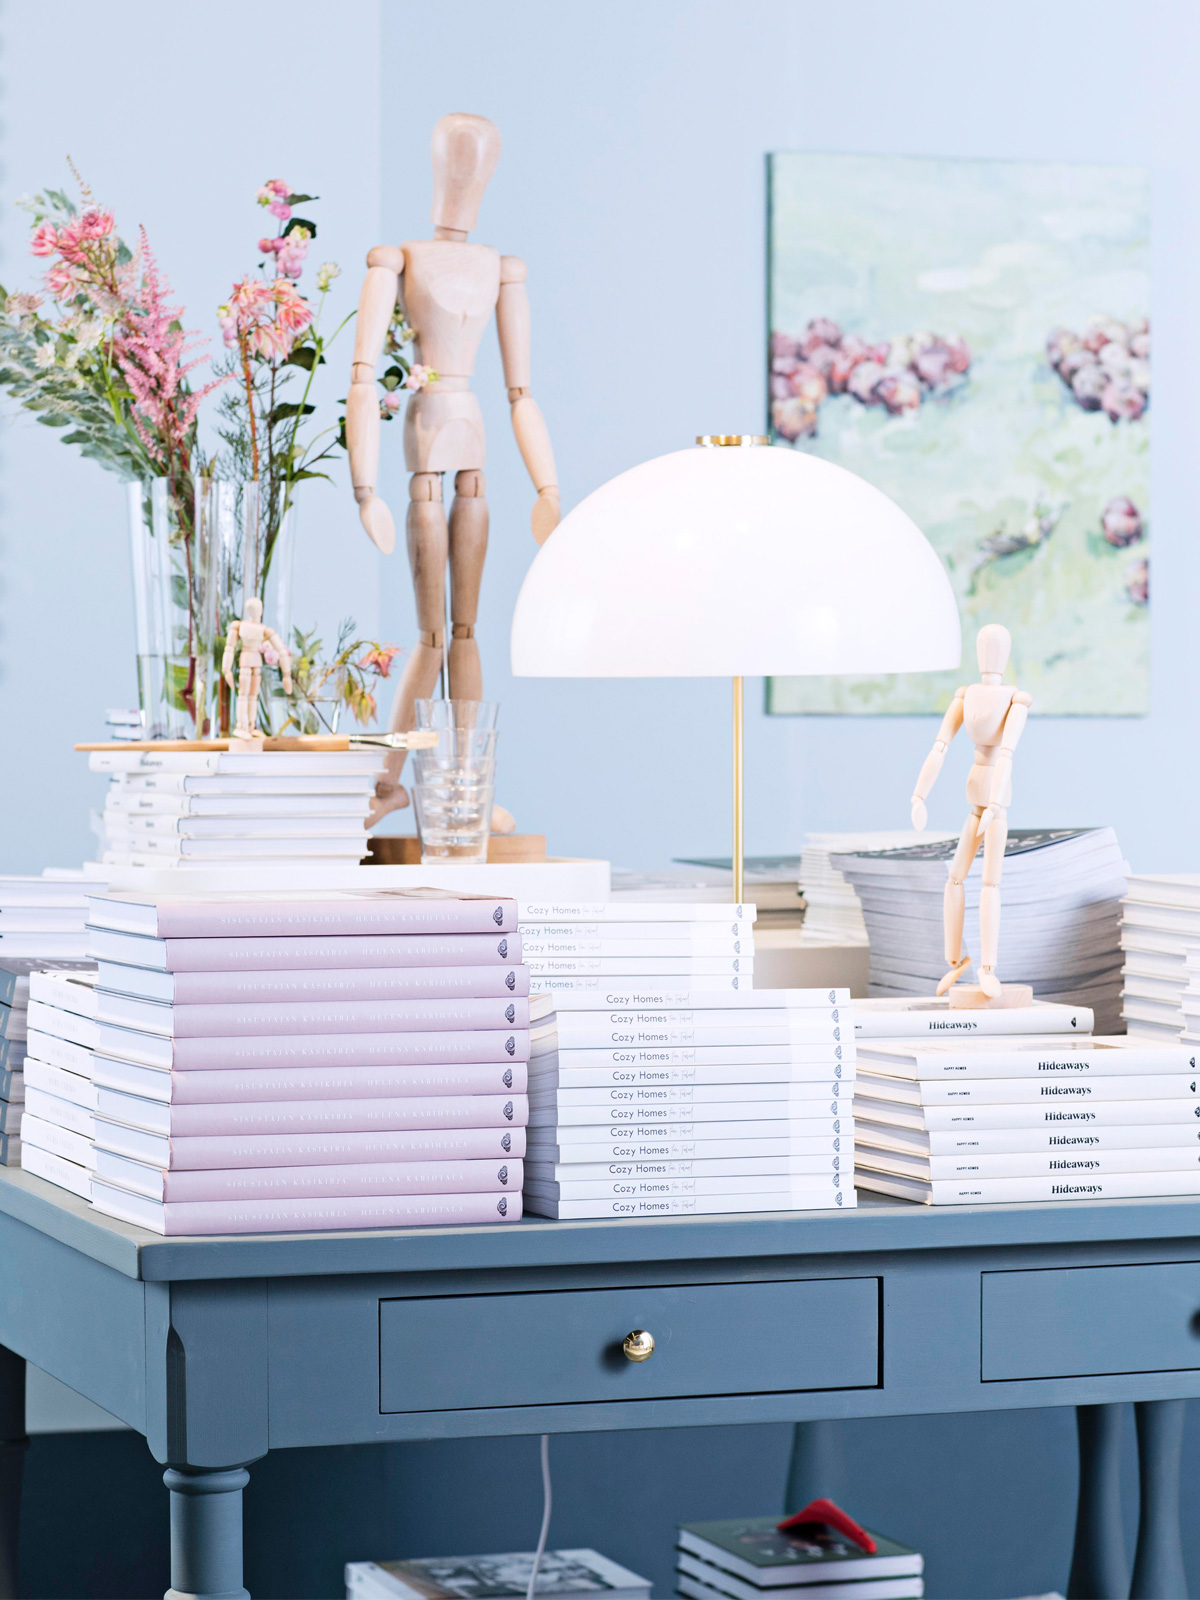 Kupoli Innolux klassische Designerleuchte DesignOrt Onlineshop Fachhandel Lampenladen Berlin Leuchten